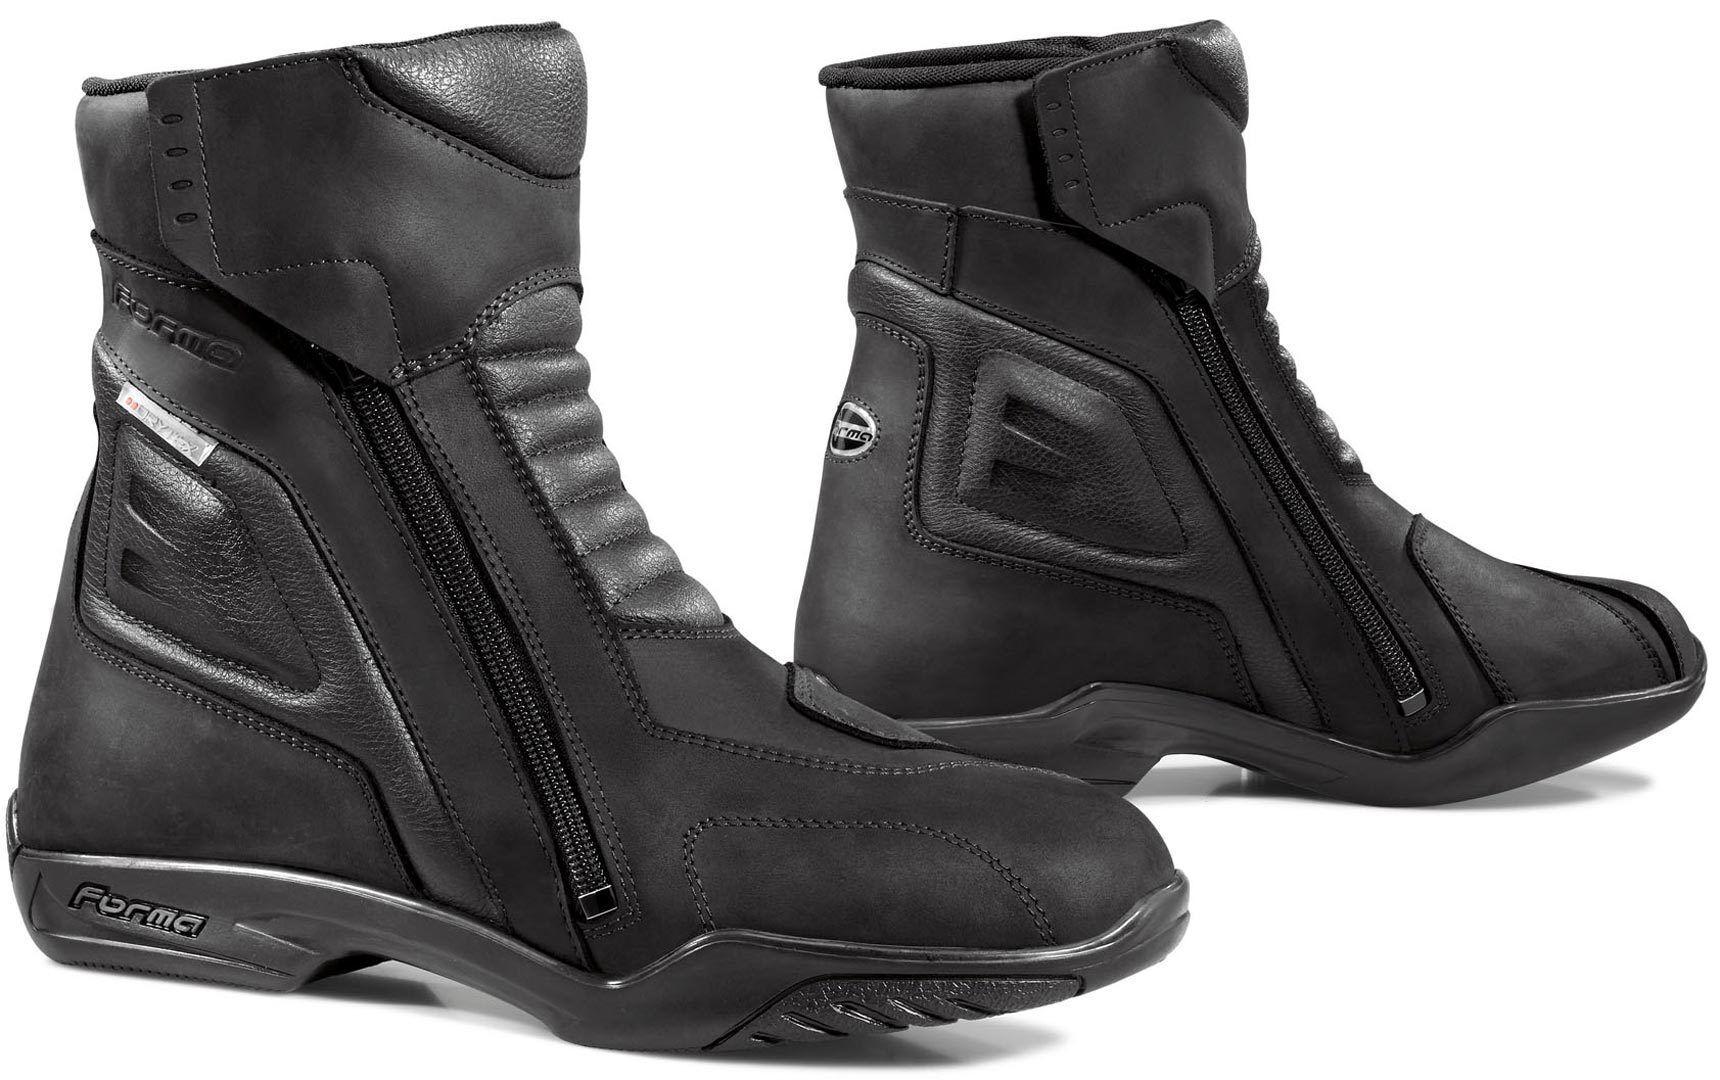 Forma Latino Bottes de moto imperméables Noir taille : 40